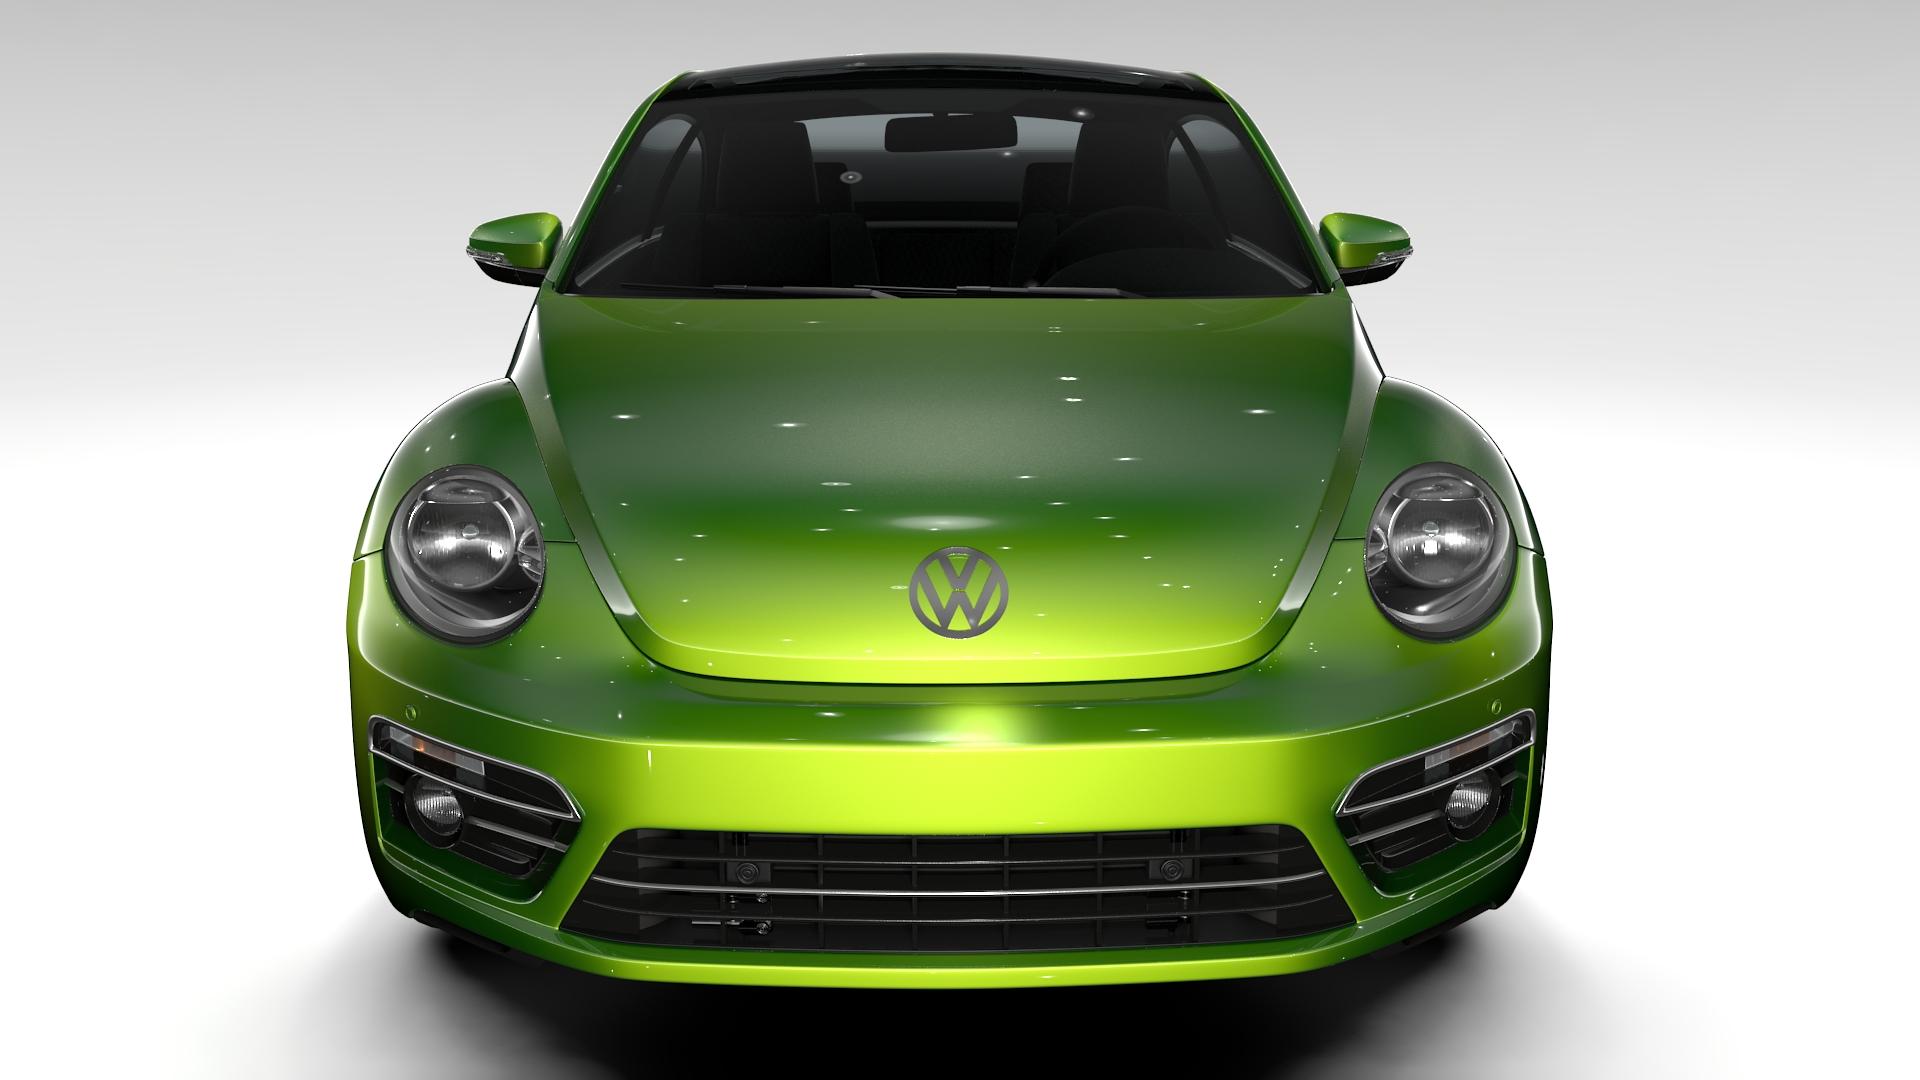 vw beetle 2017 3d model 3ds max fbx c4d lwo ma mb hrc xsi obj 221566